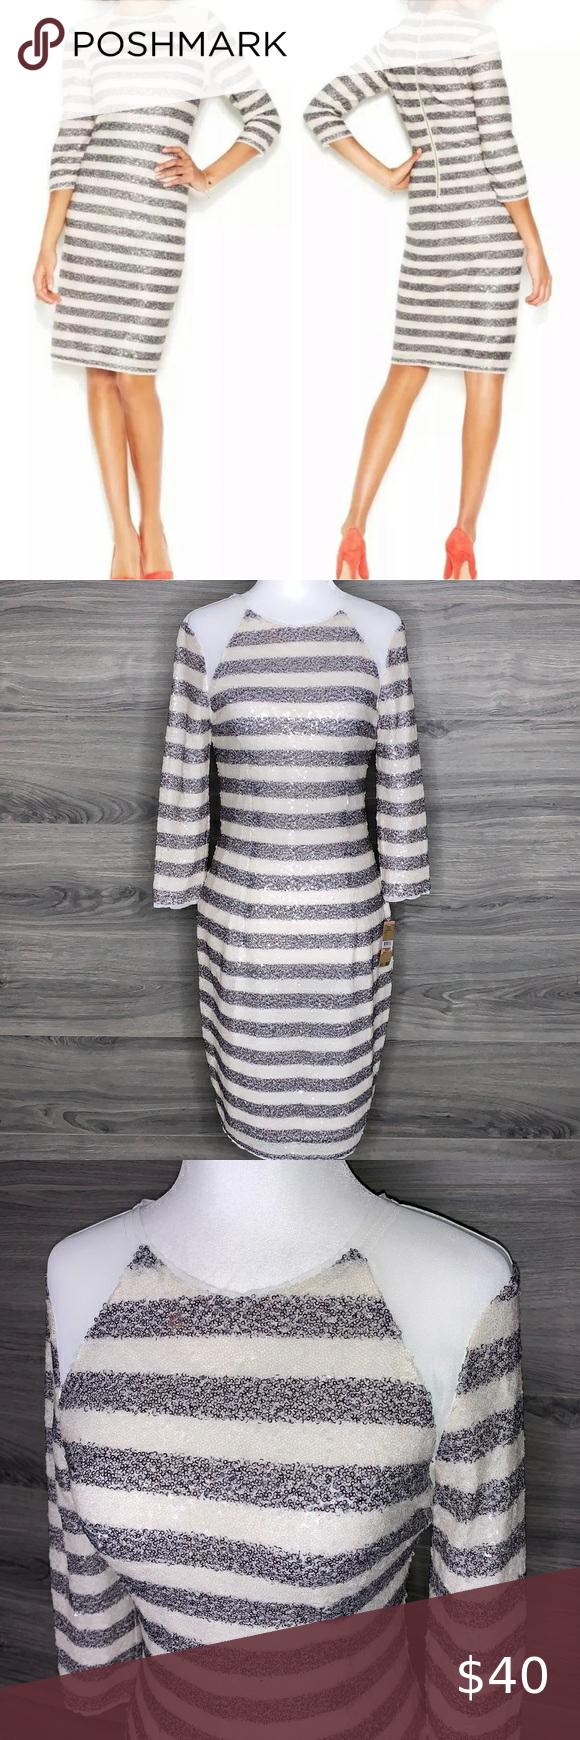 RACHEL Rachel Roy Sequined Form Fitted Dress 2